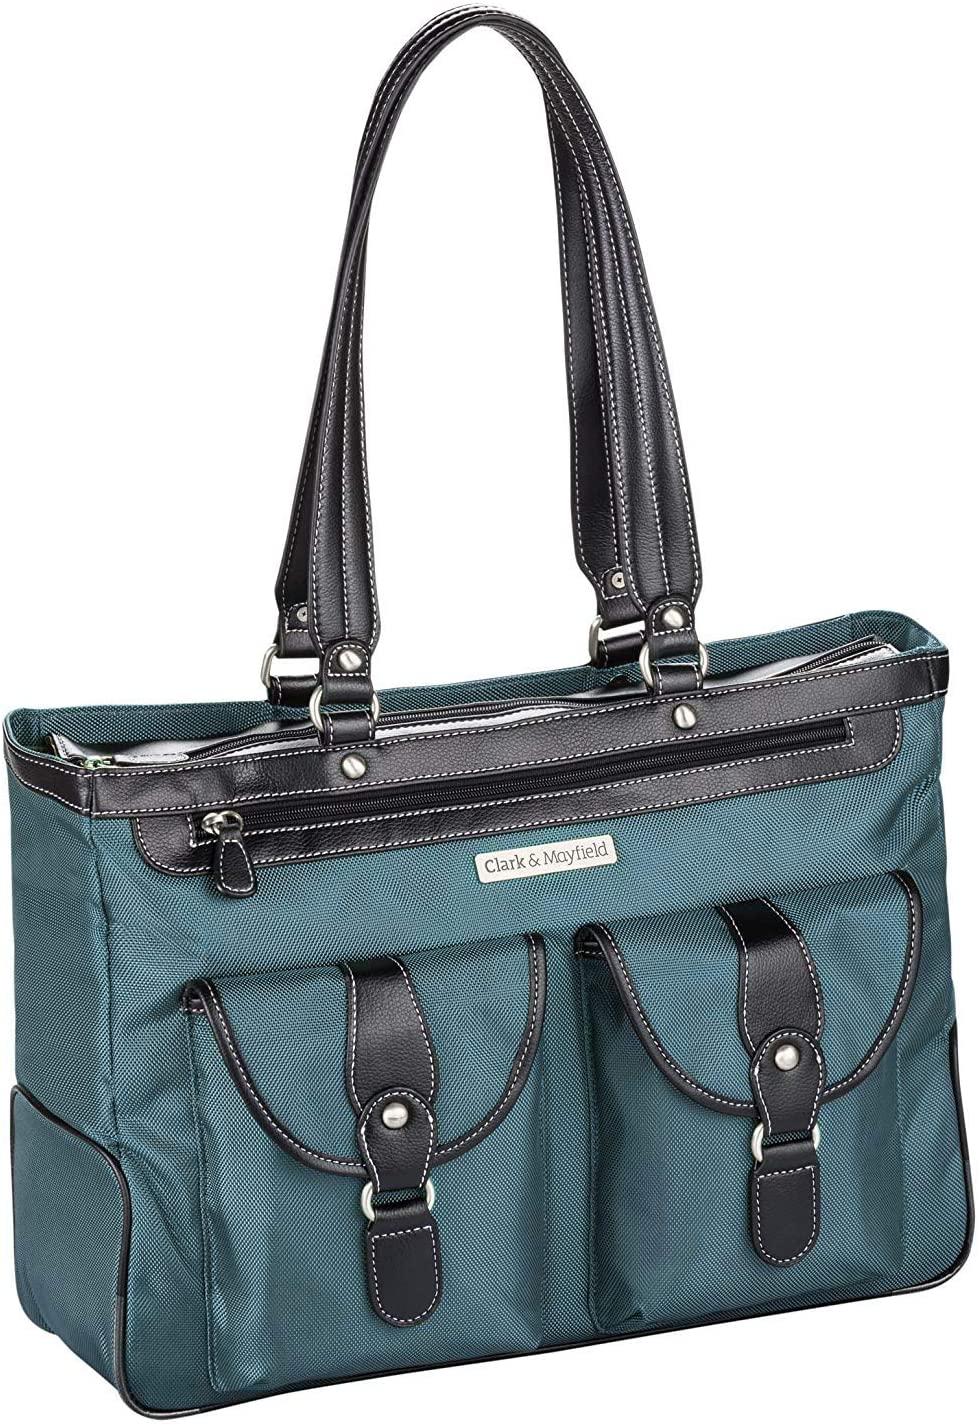 Clark & Mayfield Marquam Metro Laptop Handbag 18.4 (Deep Teal)